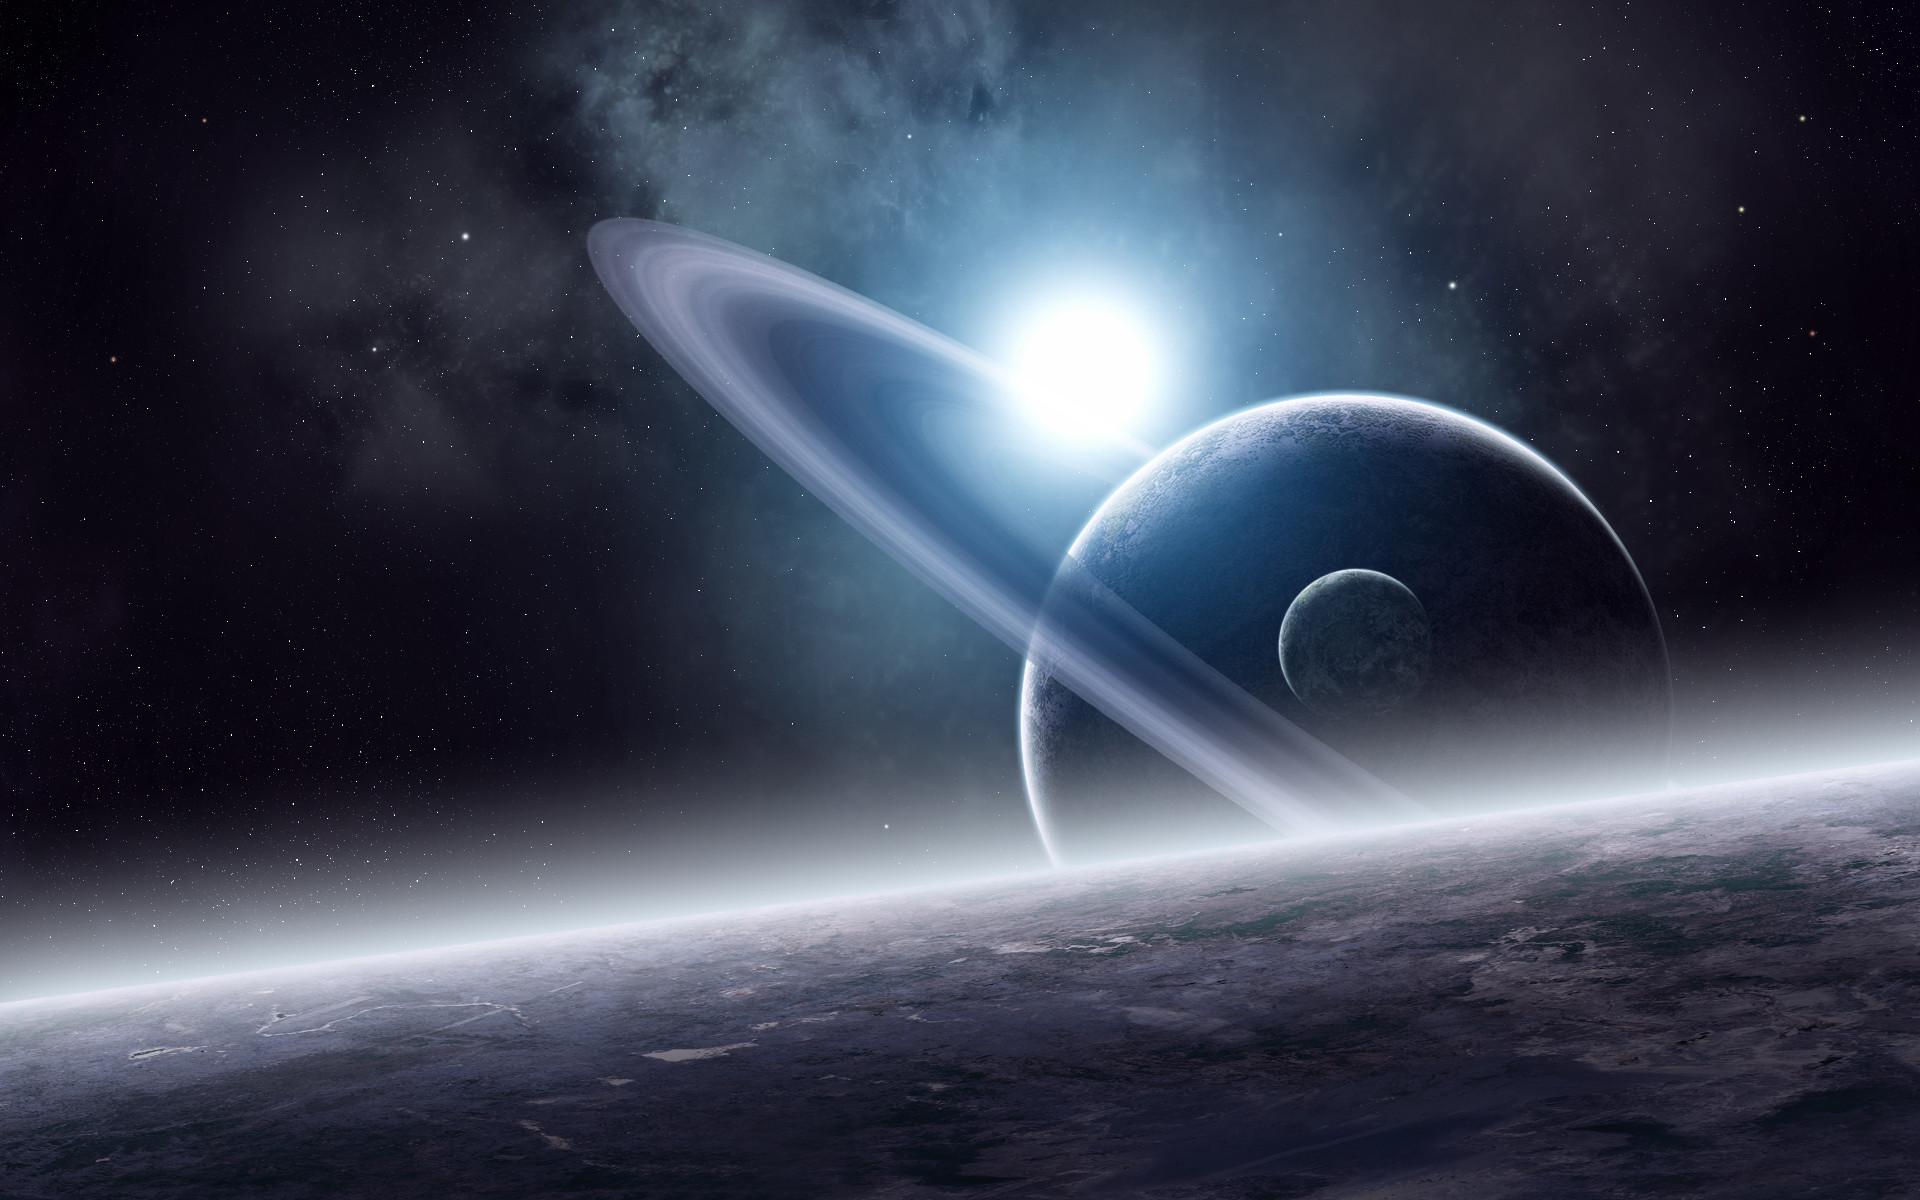 Astronomy Desktop Backgrounds (59+ images)